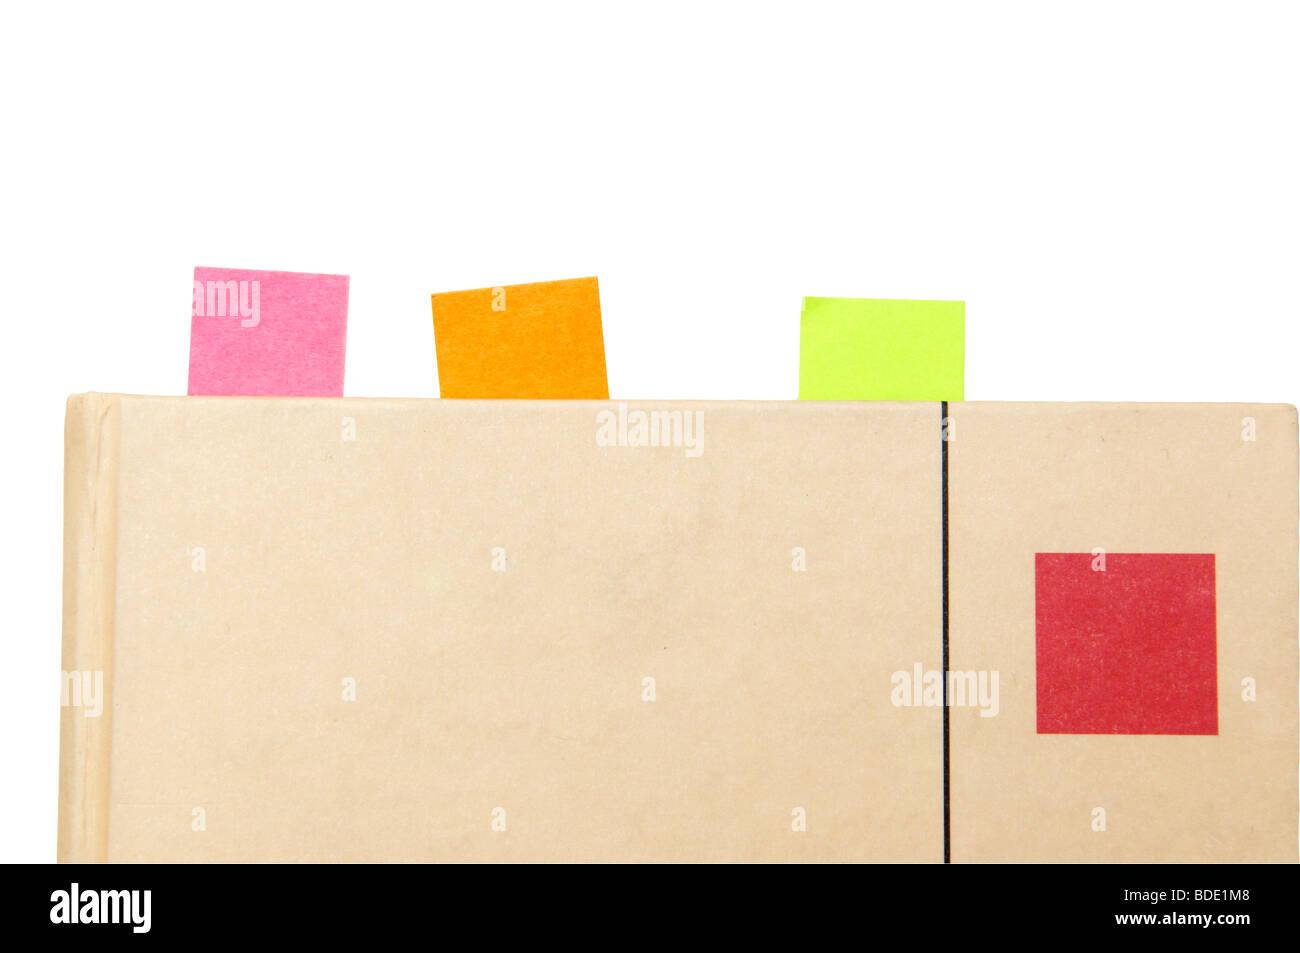 Reserve con marcadores pegajoso, sobre fondo blanco. Imagen De Stock